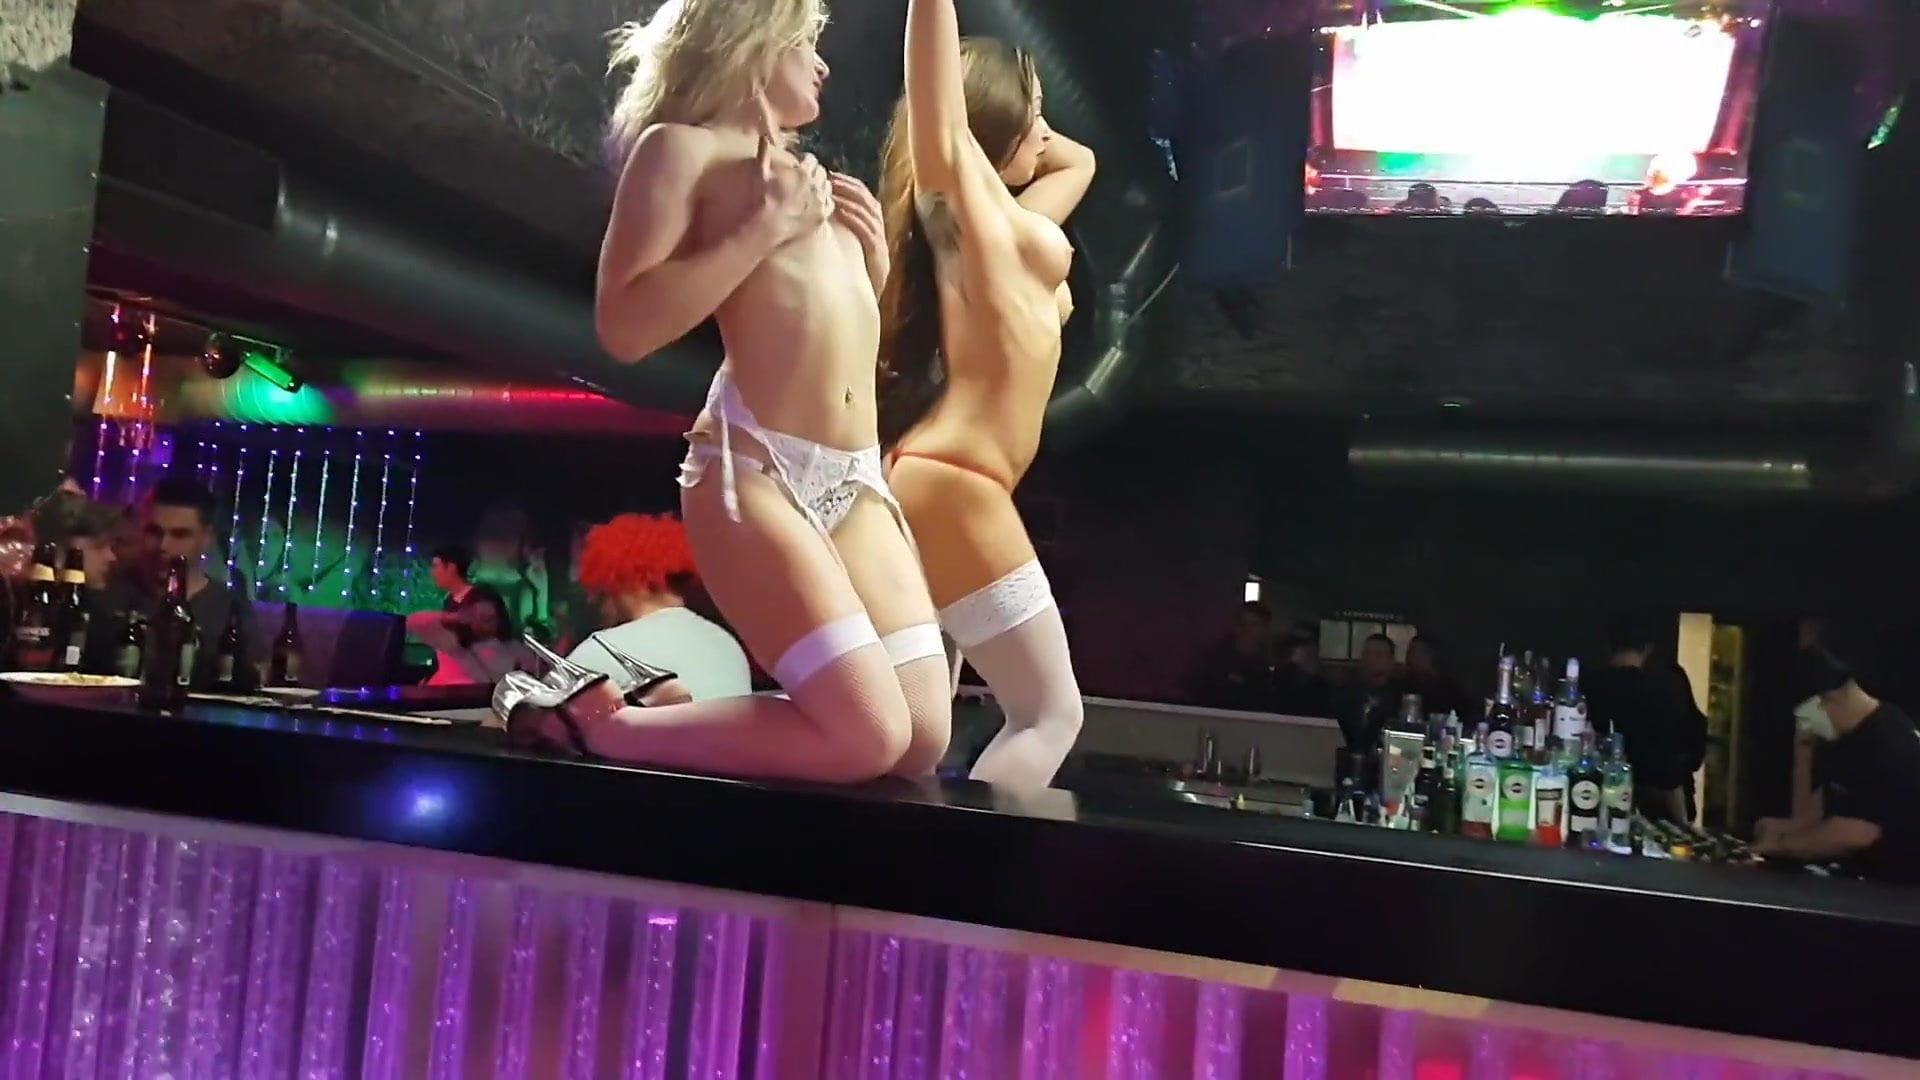 Голые девушки стриптиз видео hd